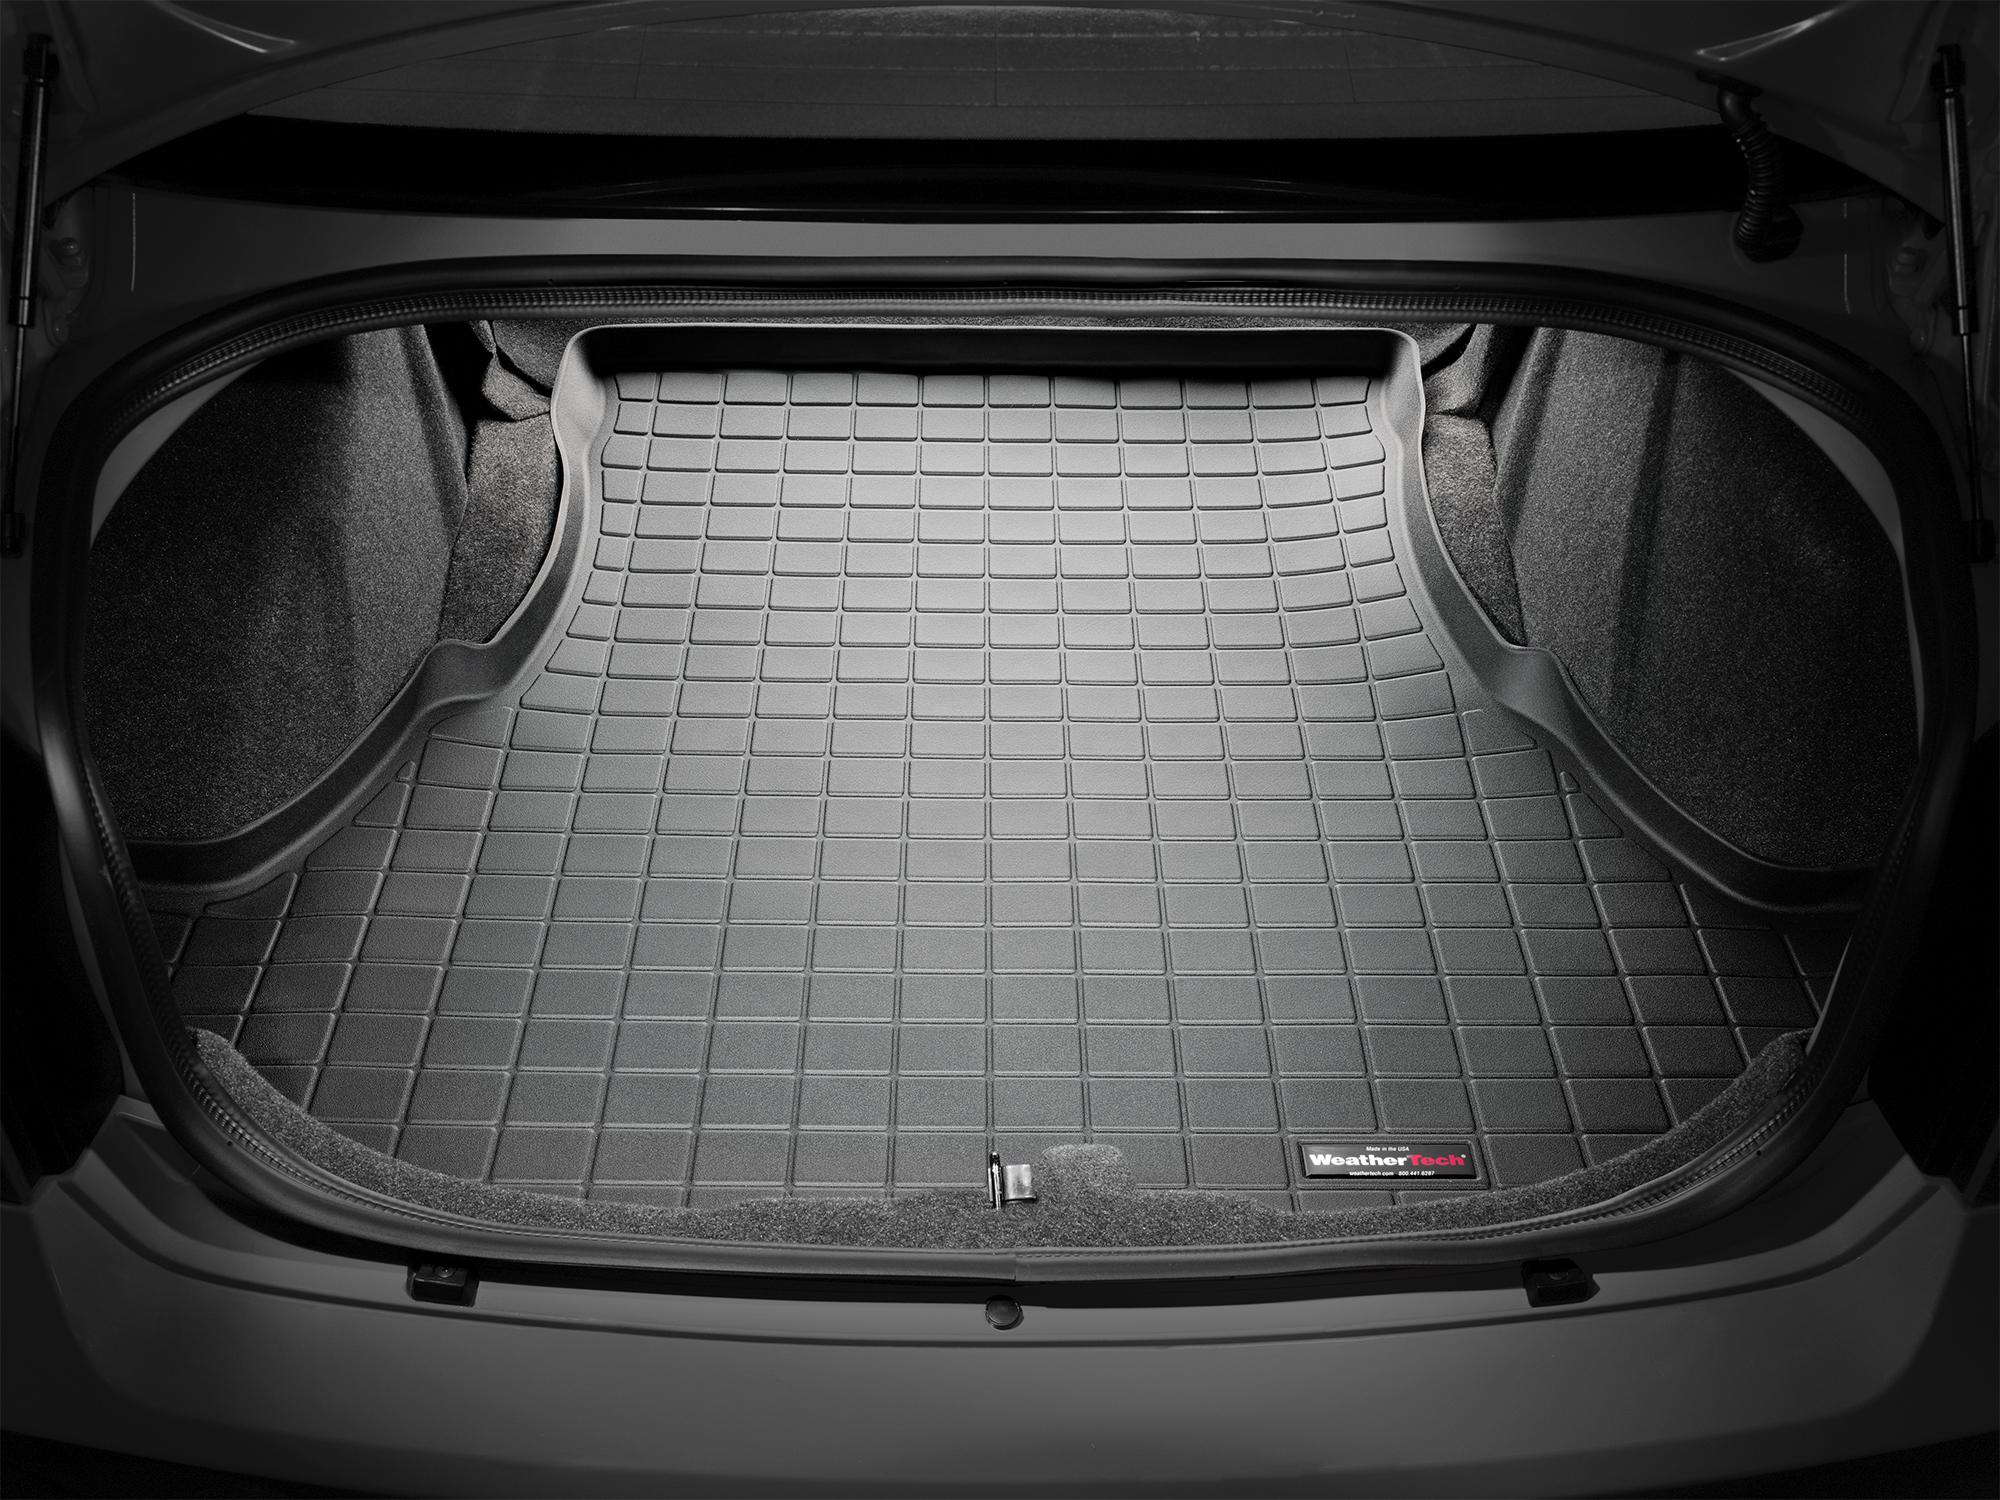 Lancia Thema 2011>2014 Vasca proteggi baule tappeto bagagliaio nero *721